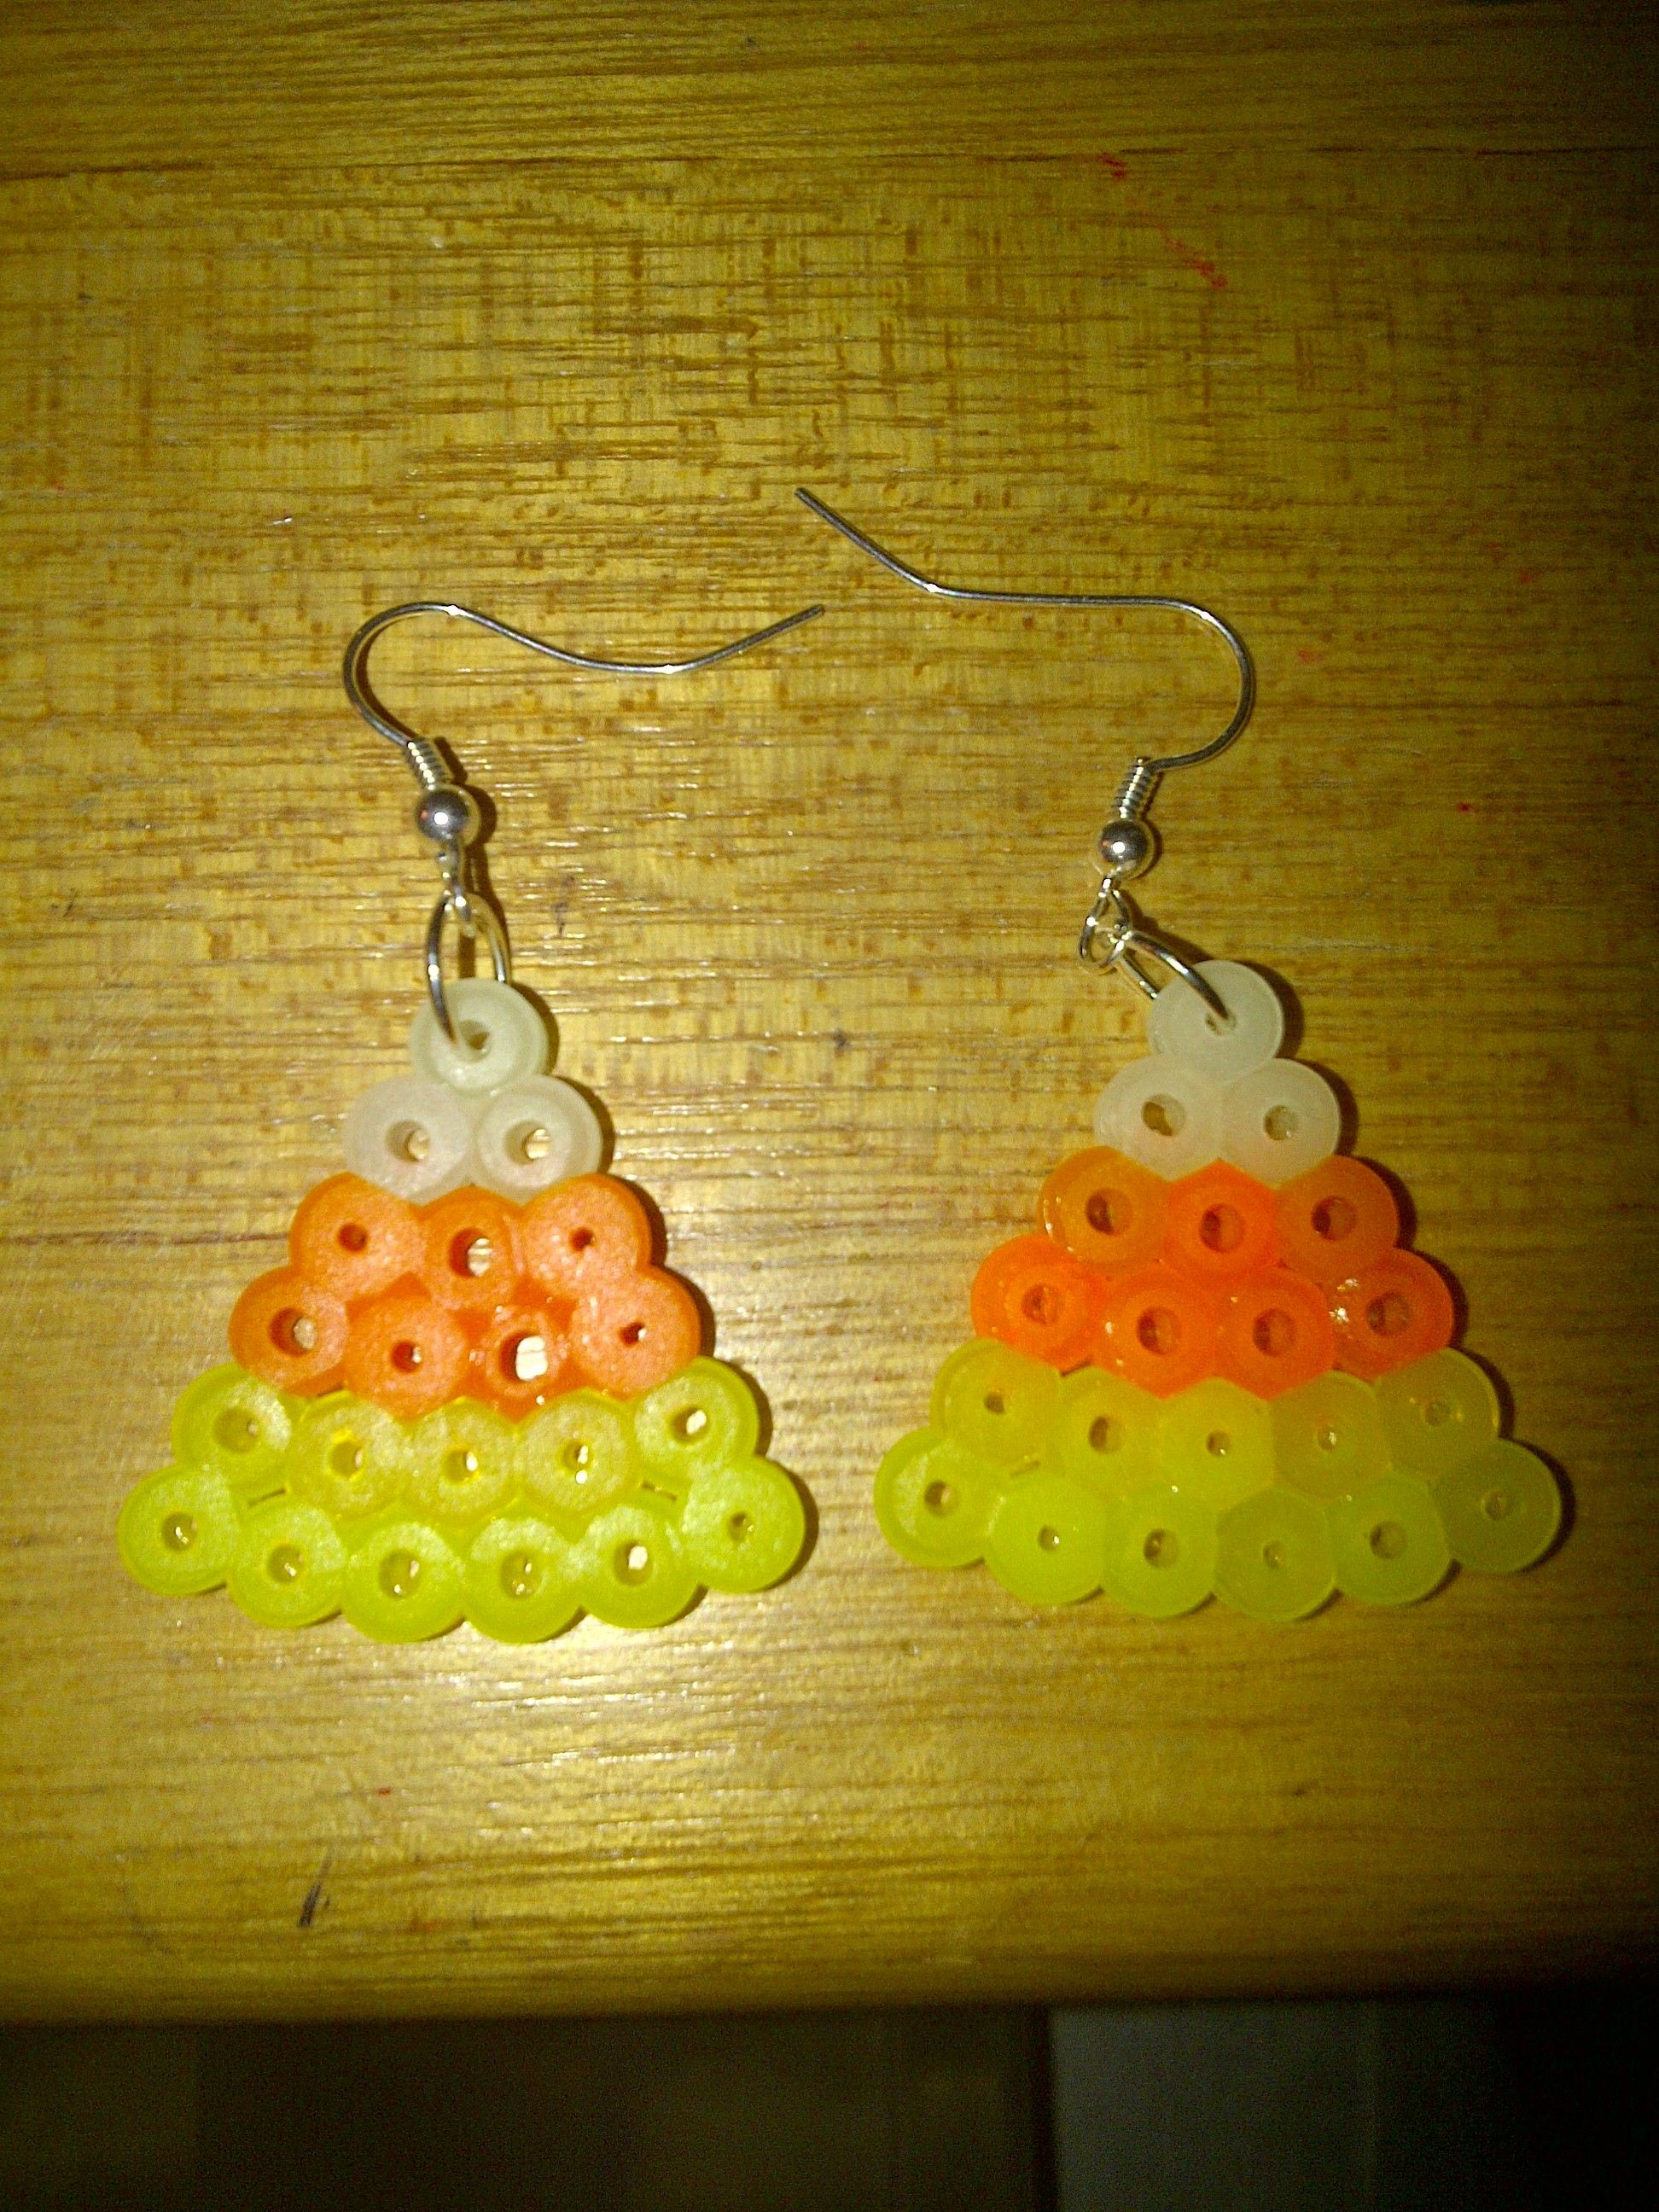 Candy Corn Earrings Perler Beads By Tiffany Sheaffer Great Idea For  Halloween